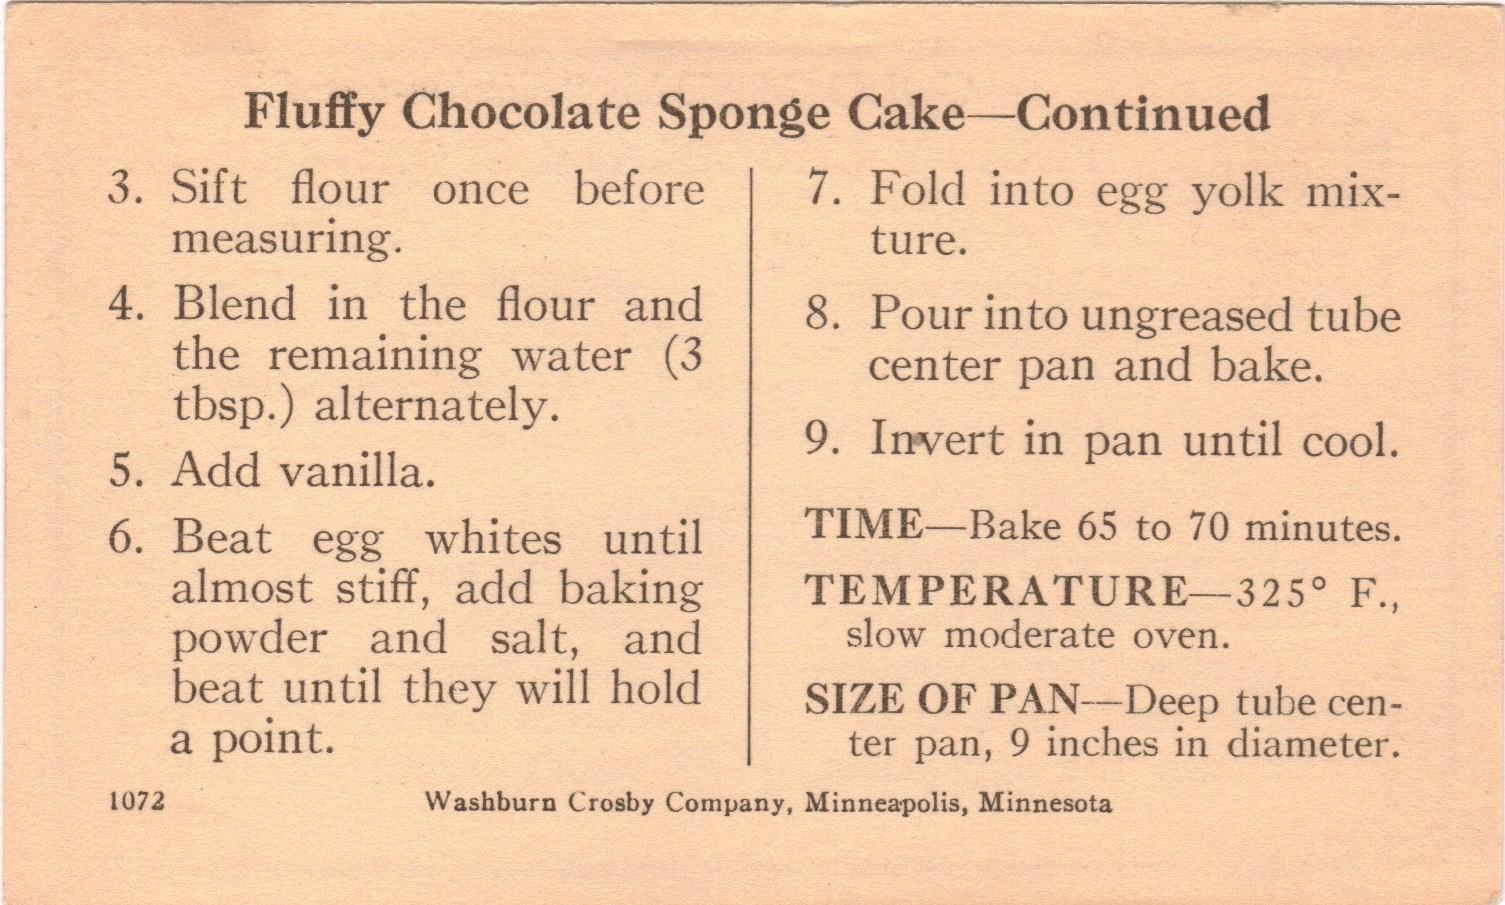 Super fluffy sponge cake recipe - Food for health recipes